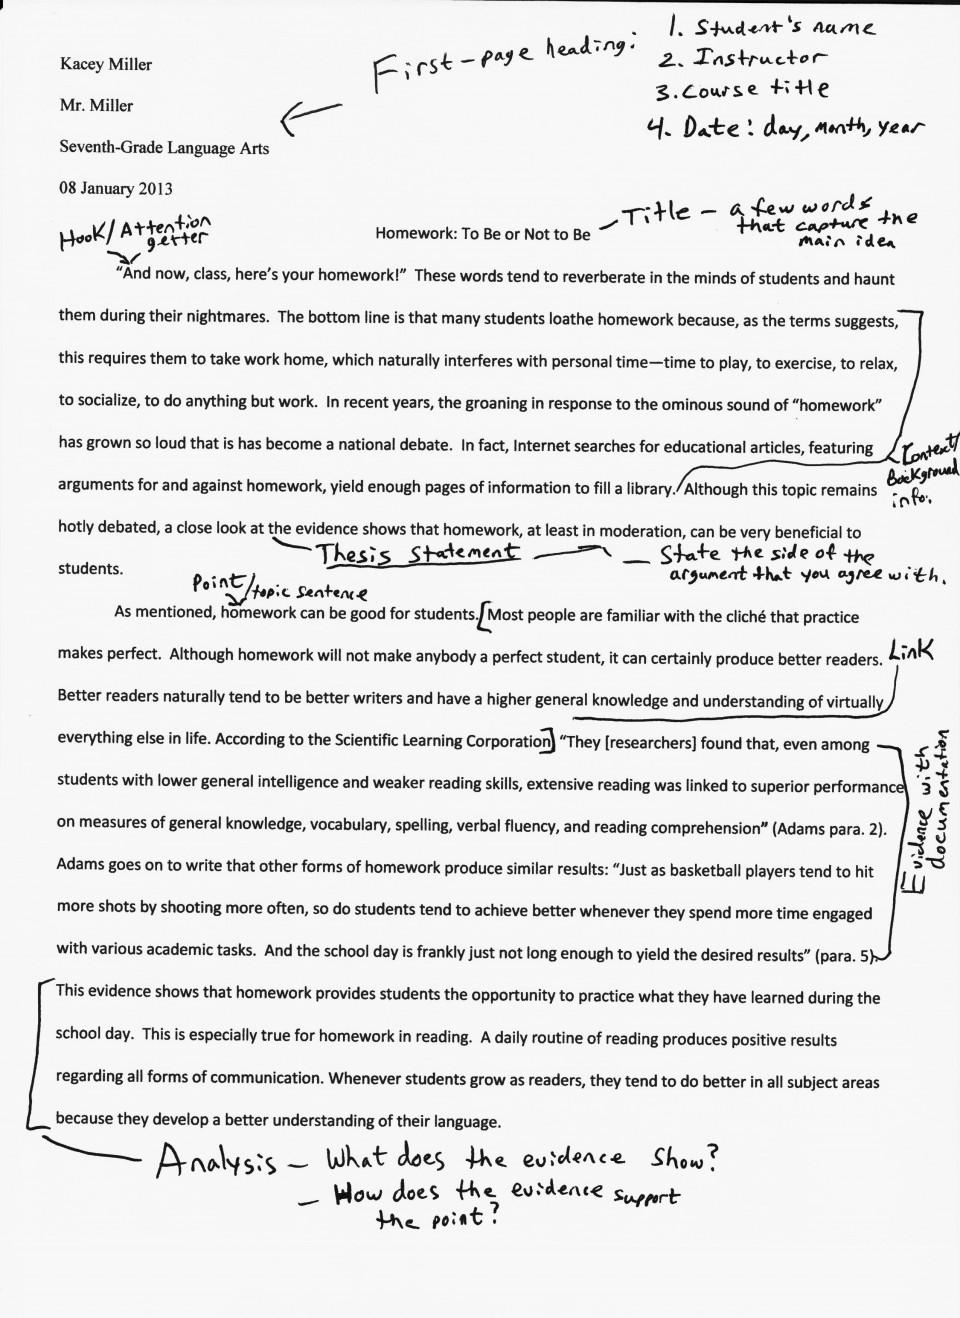 Essay for ucla undergraduate application